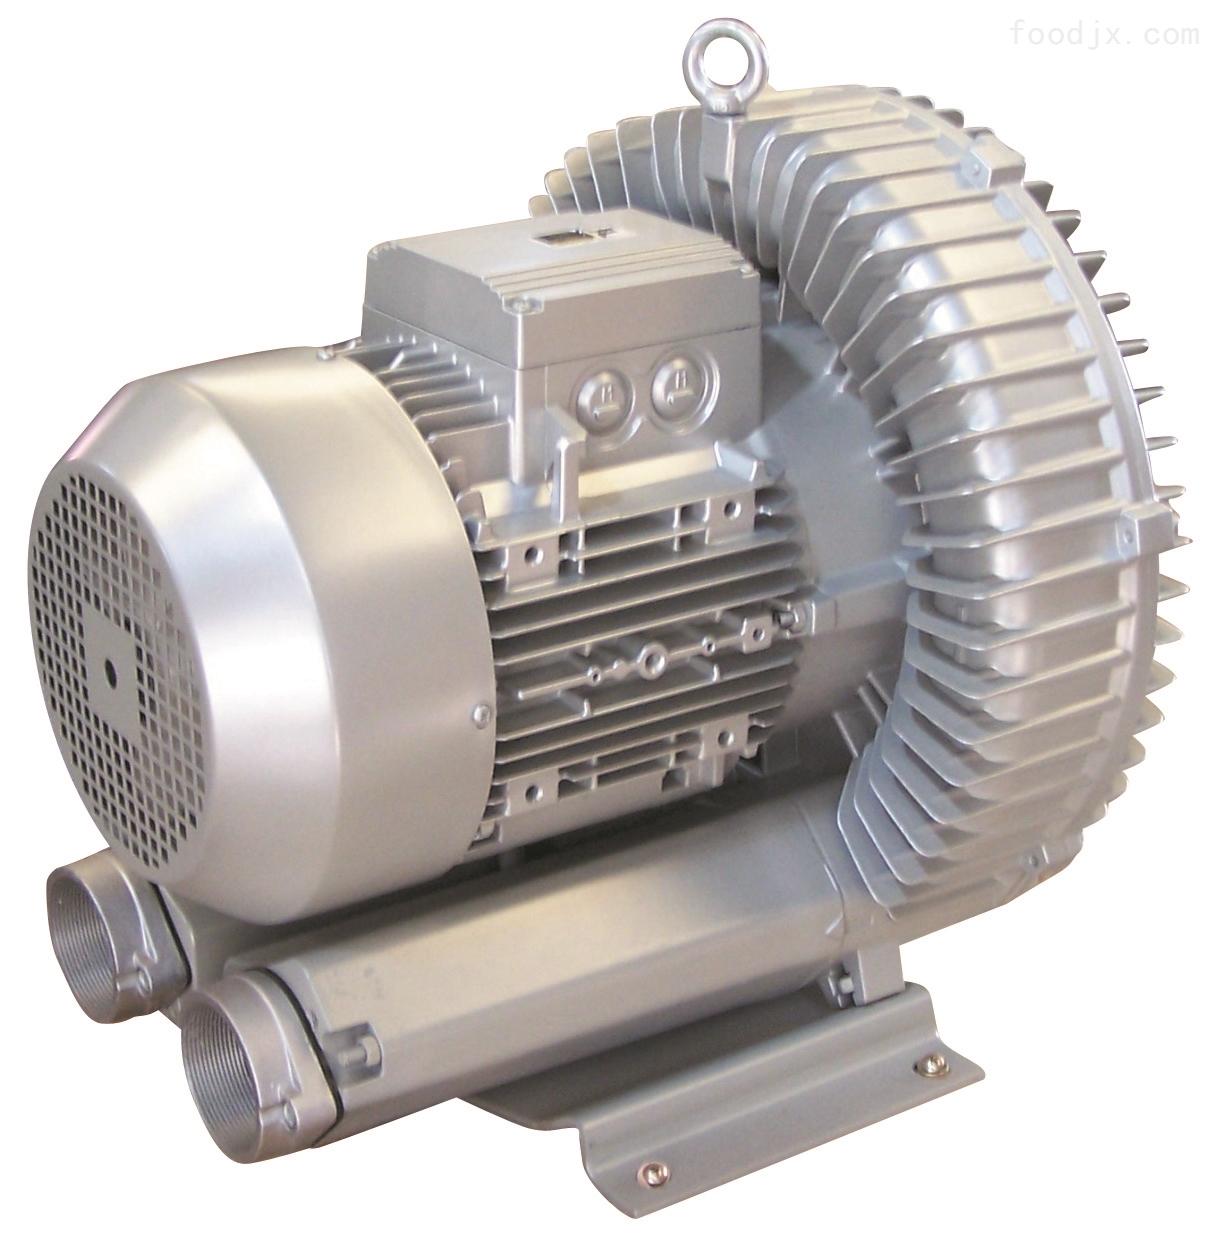 RB系列高压鼓风机详细安装尺寸